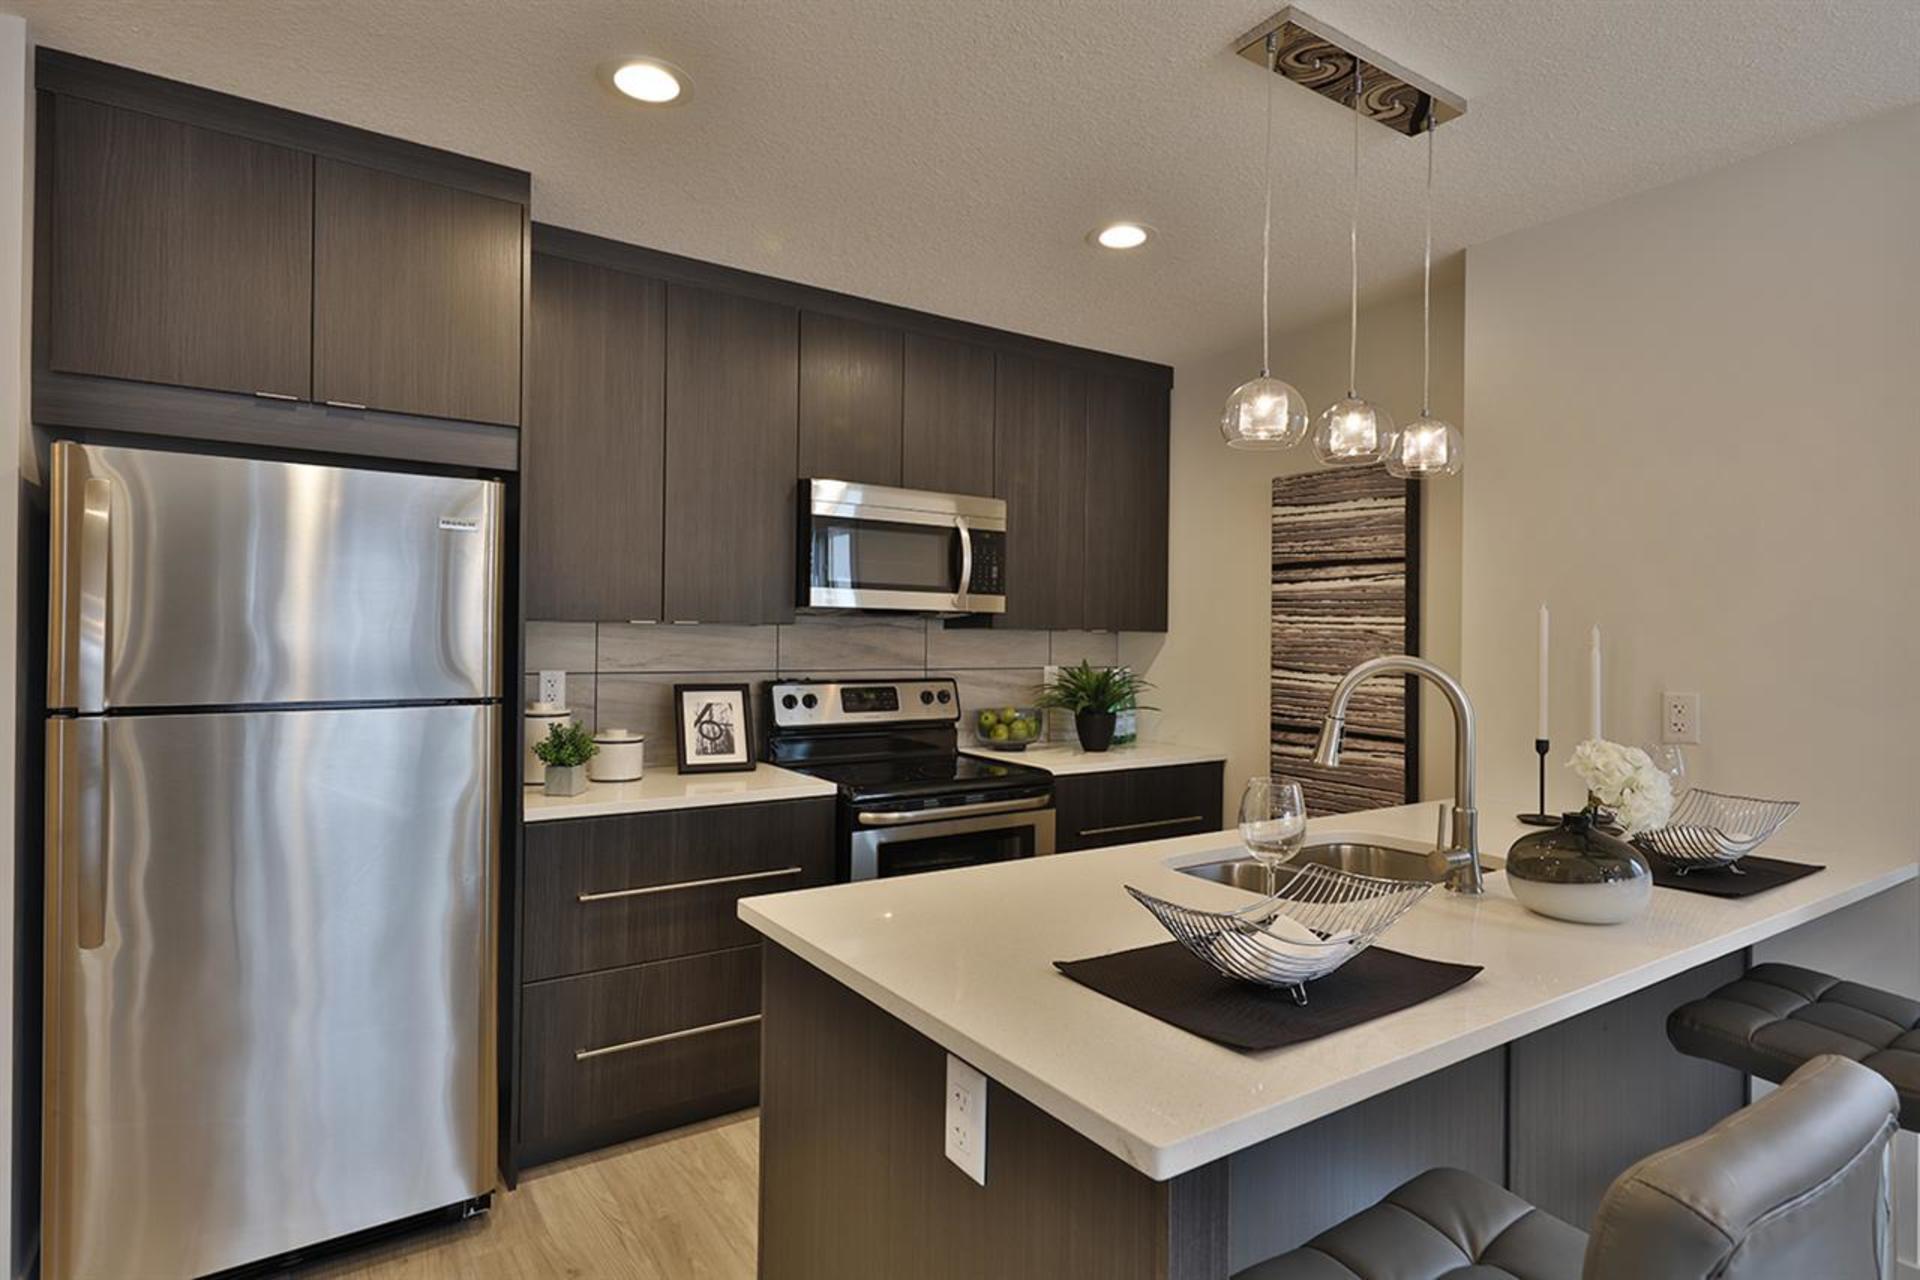 12037-93-street-alberta-avenue-edmonton-05 at 12037 93 Street, Alberta Avenue, Edmonton